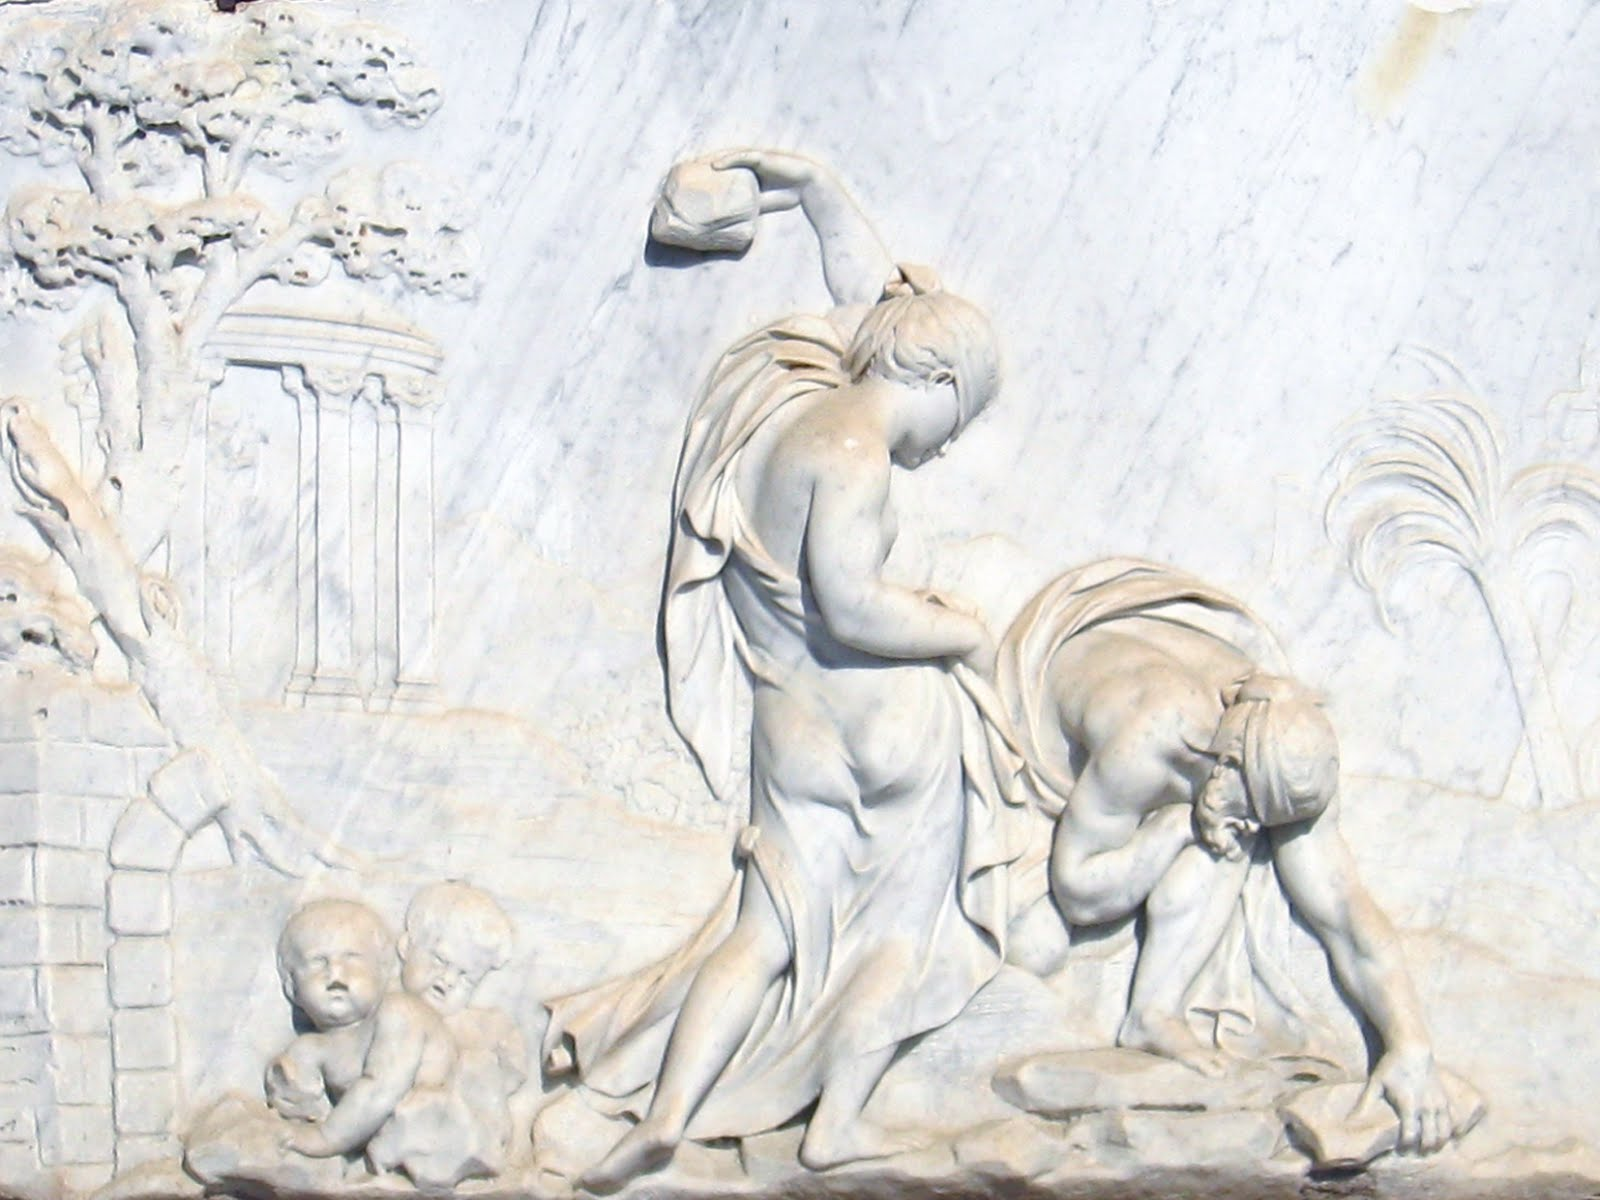 Relief_of_Deucalion_and_Pyrrha_-_Parc_del_Laberint_d'Horta_-_Barcelona.jpg